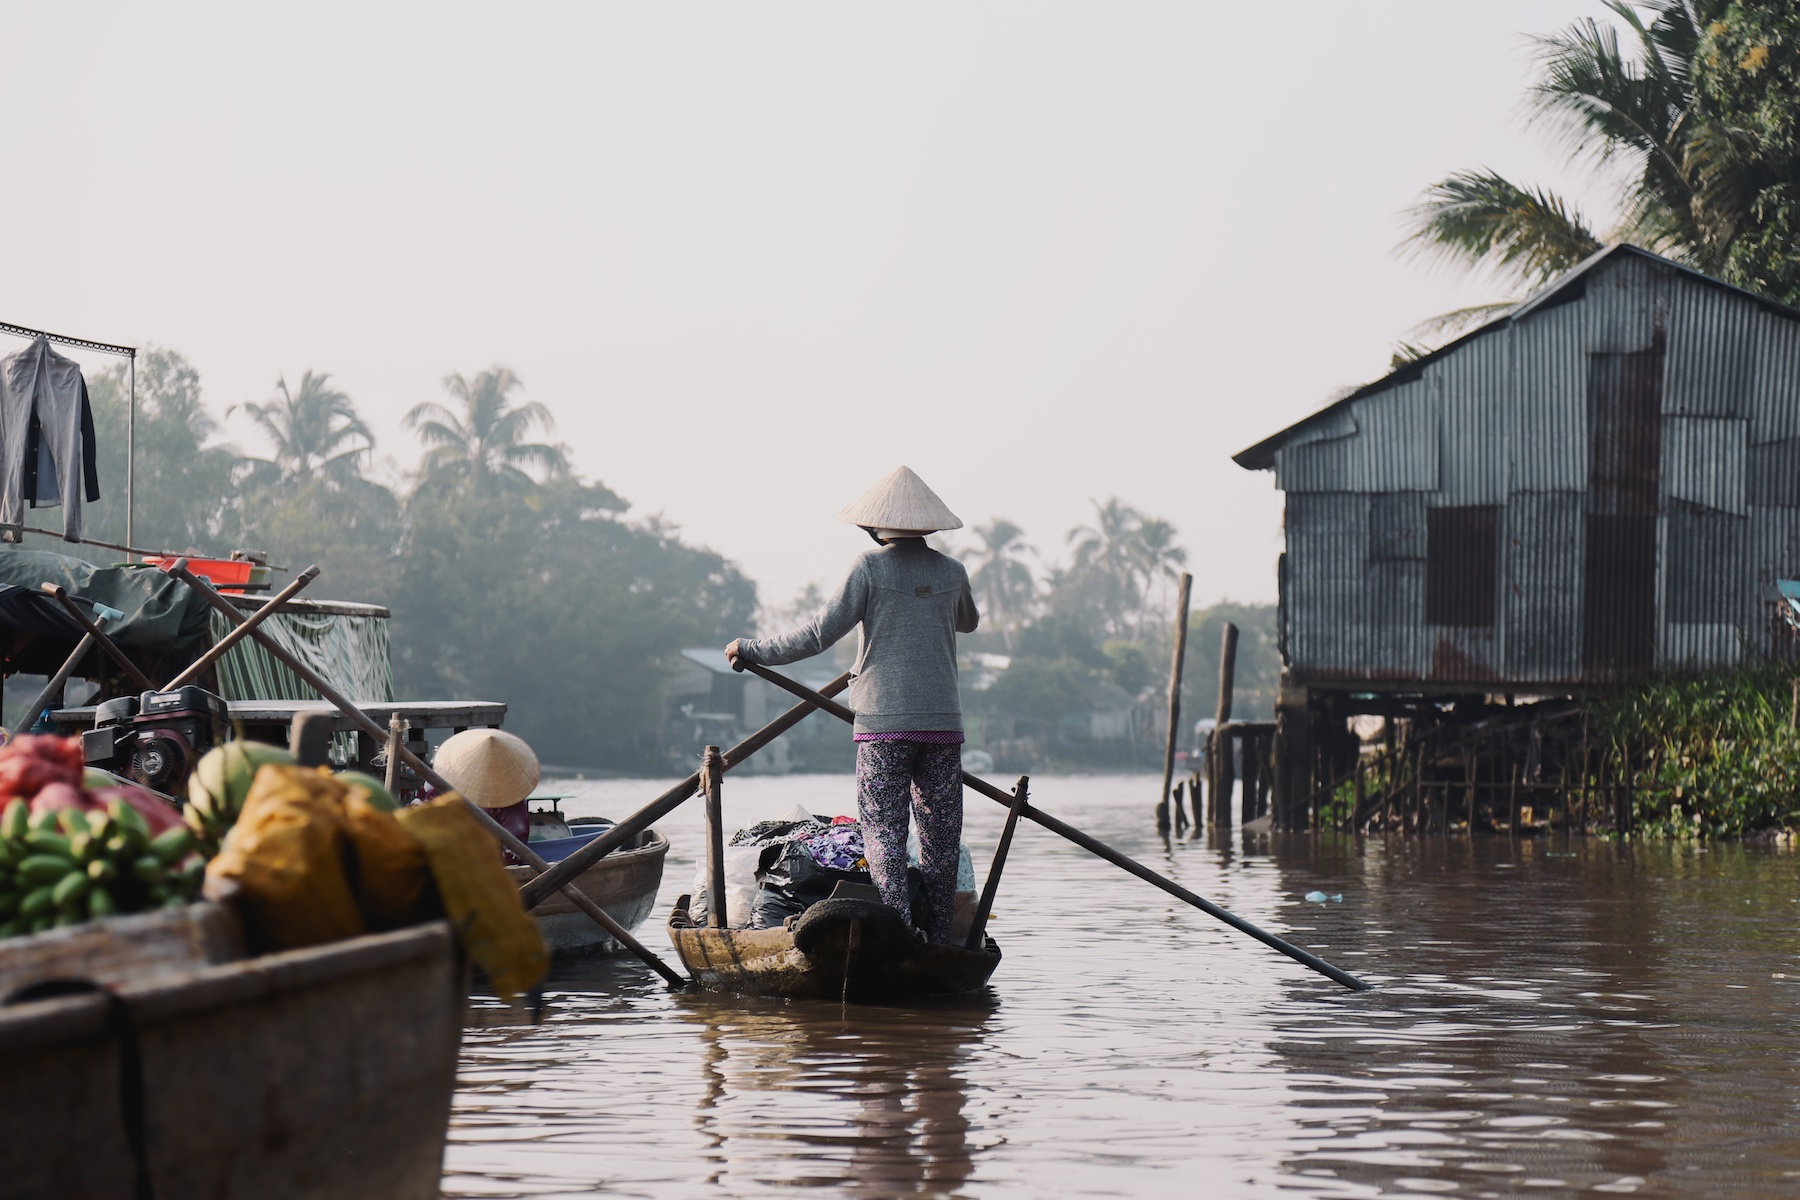 mekong delta, vietnam, traveling vietnam, boat mekong delta